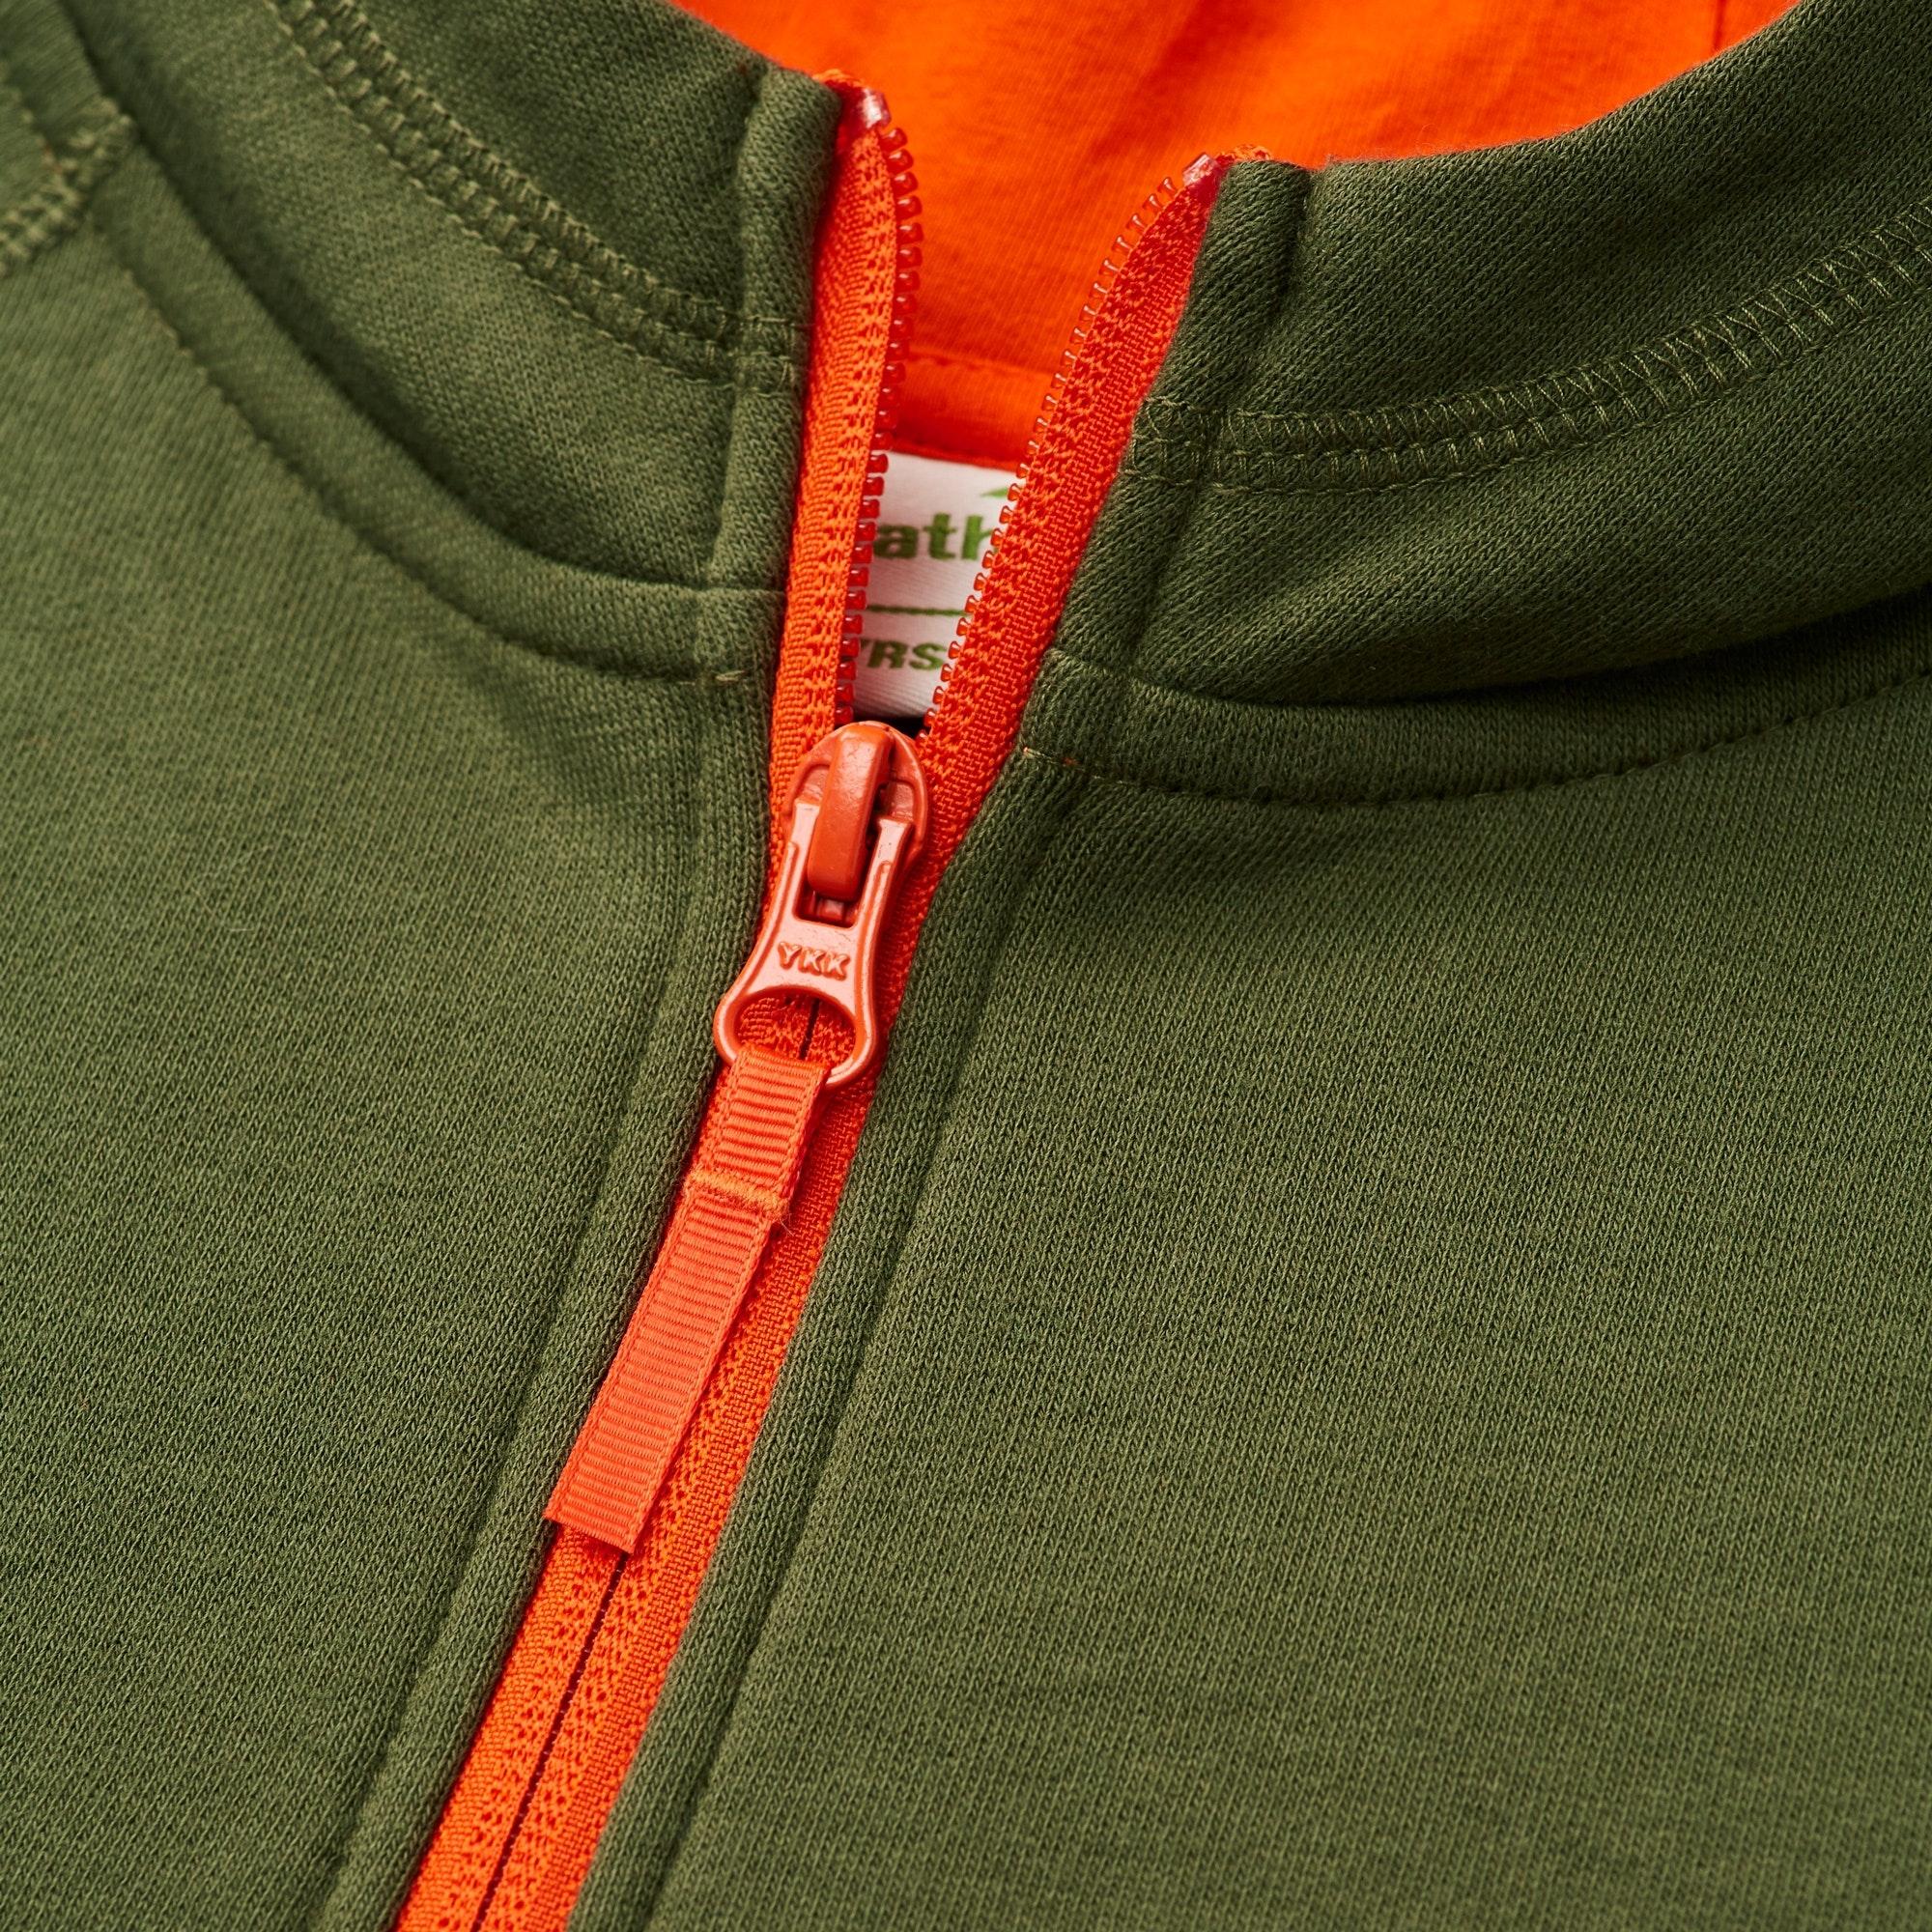 NEW-Kathmandu-Youth-Boy-039-s-Girl-039-s-Full-Zip-Hooded-Winter-Warm-Fleece-Jacket thumbnail 16